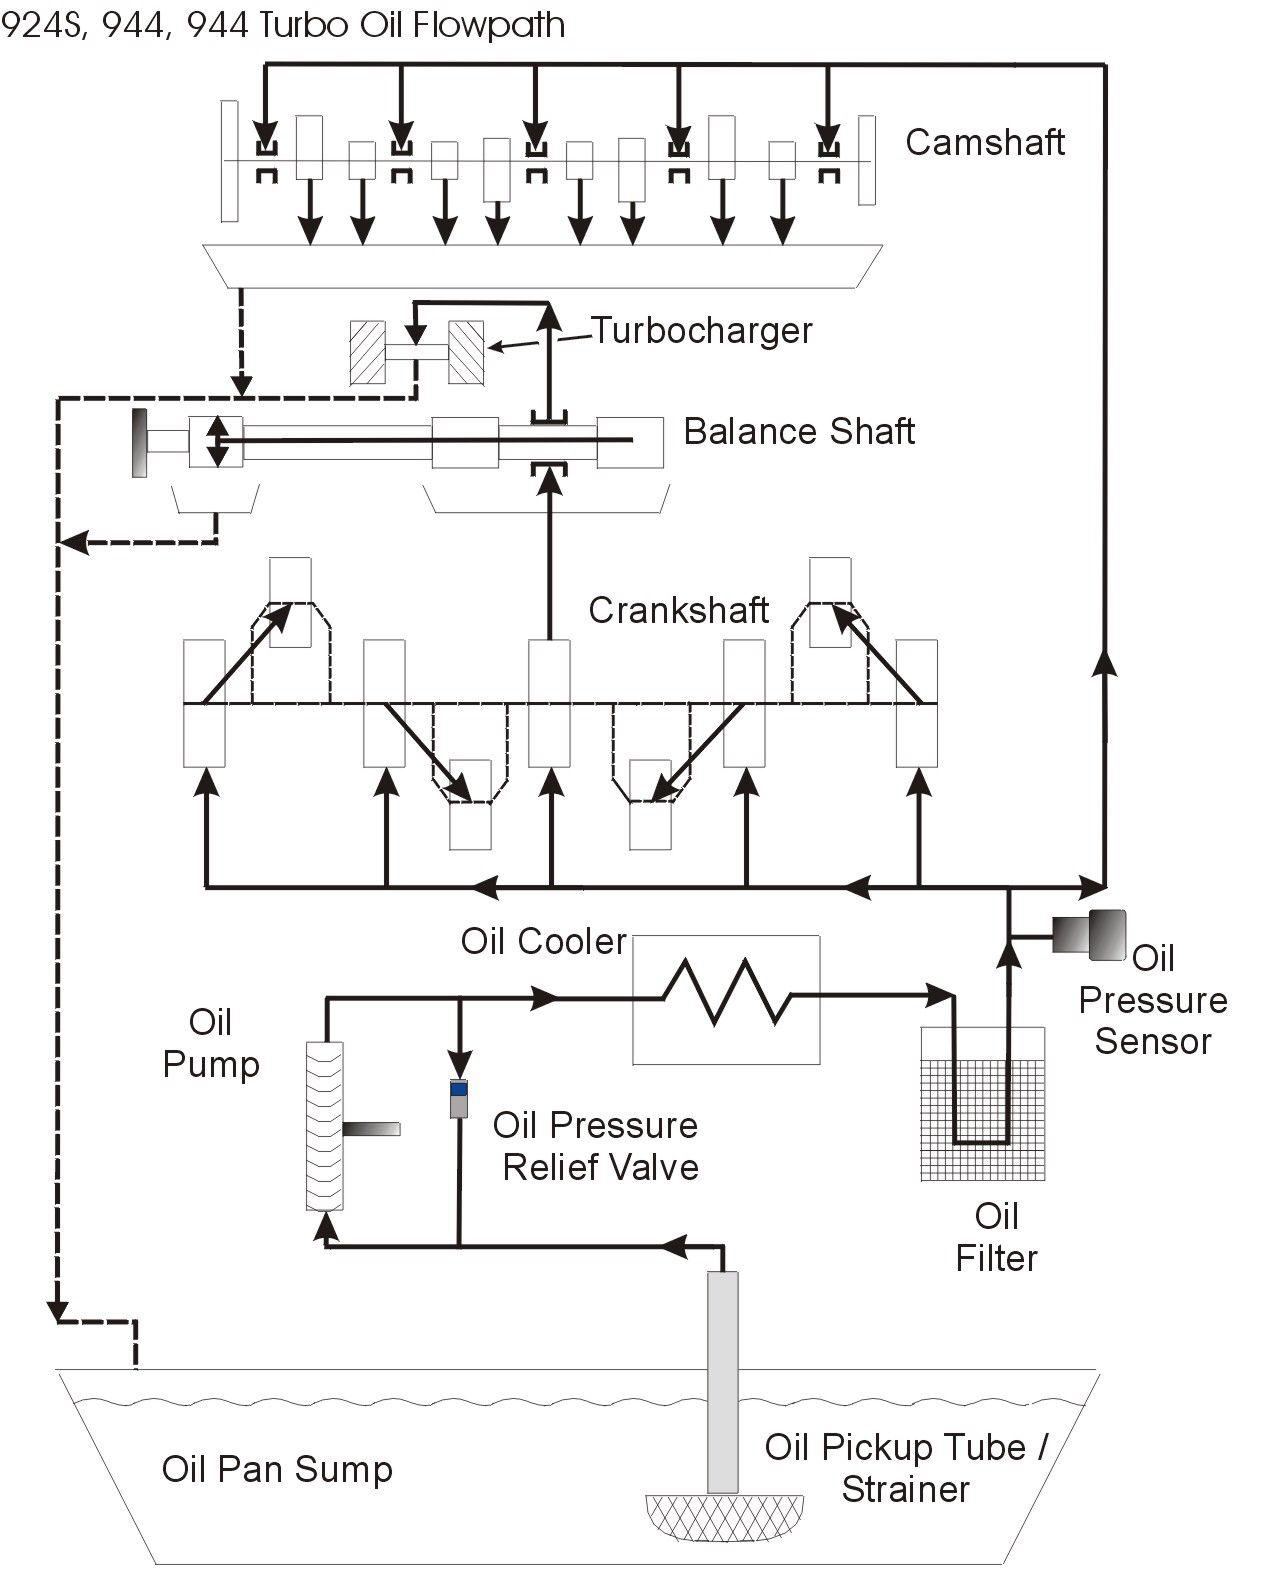 porsche 944 s2 wiring diagram 2001 honda crv fuse box engine oil flow transaxle tech pinterest